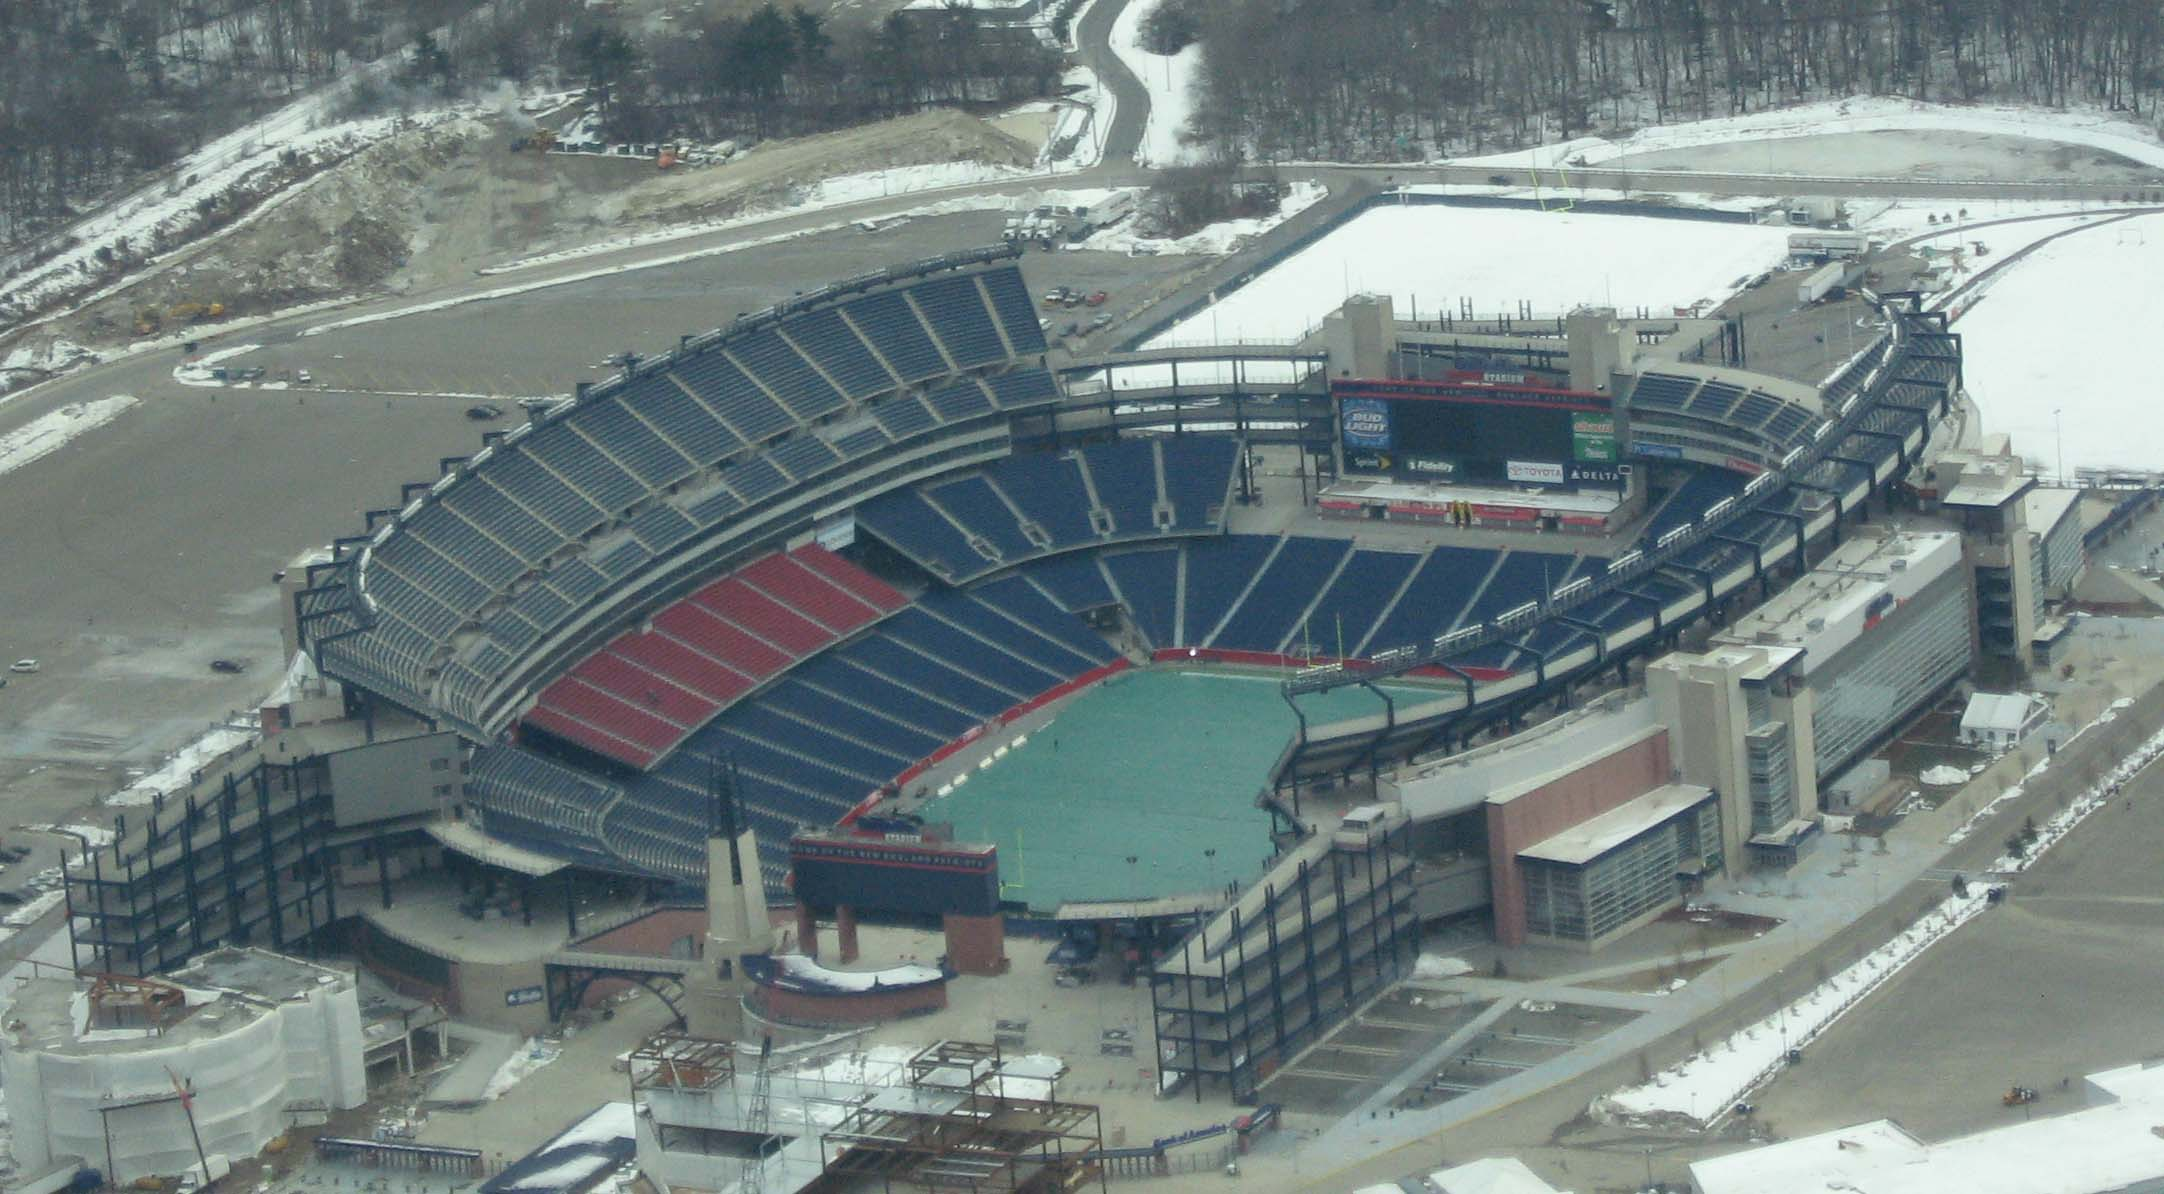 Gillette_stadium construction